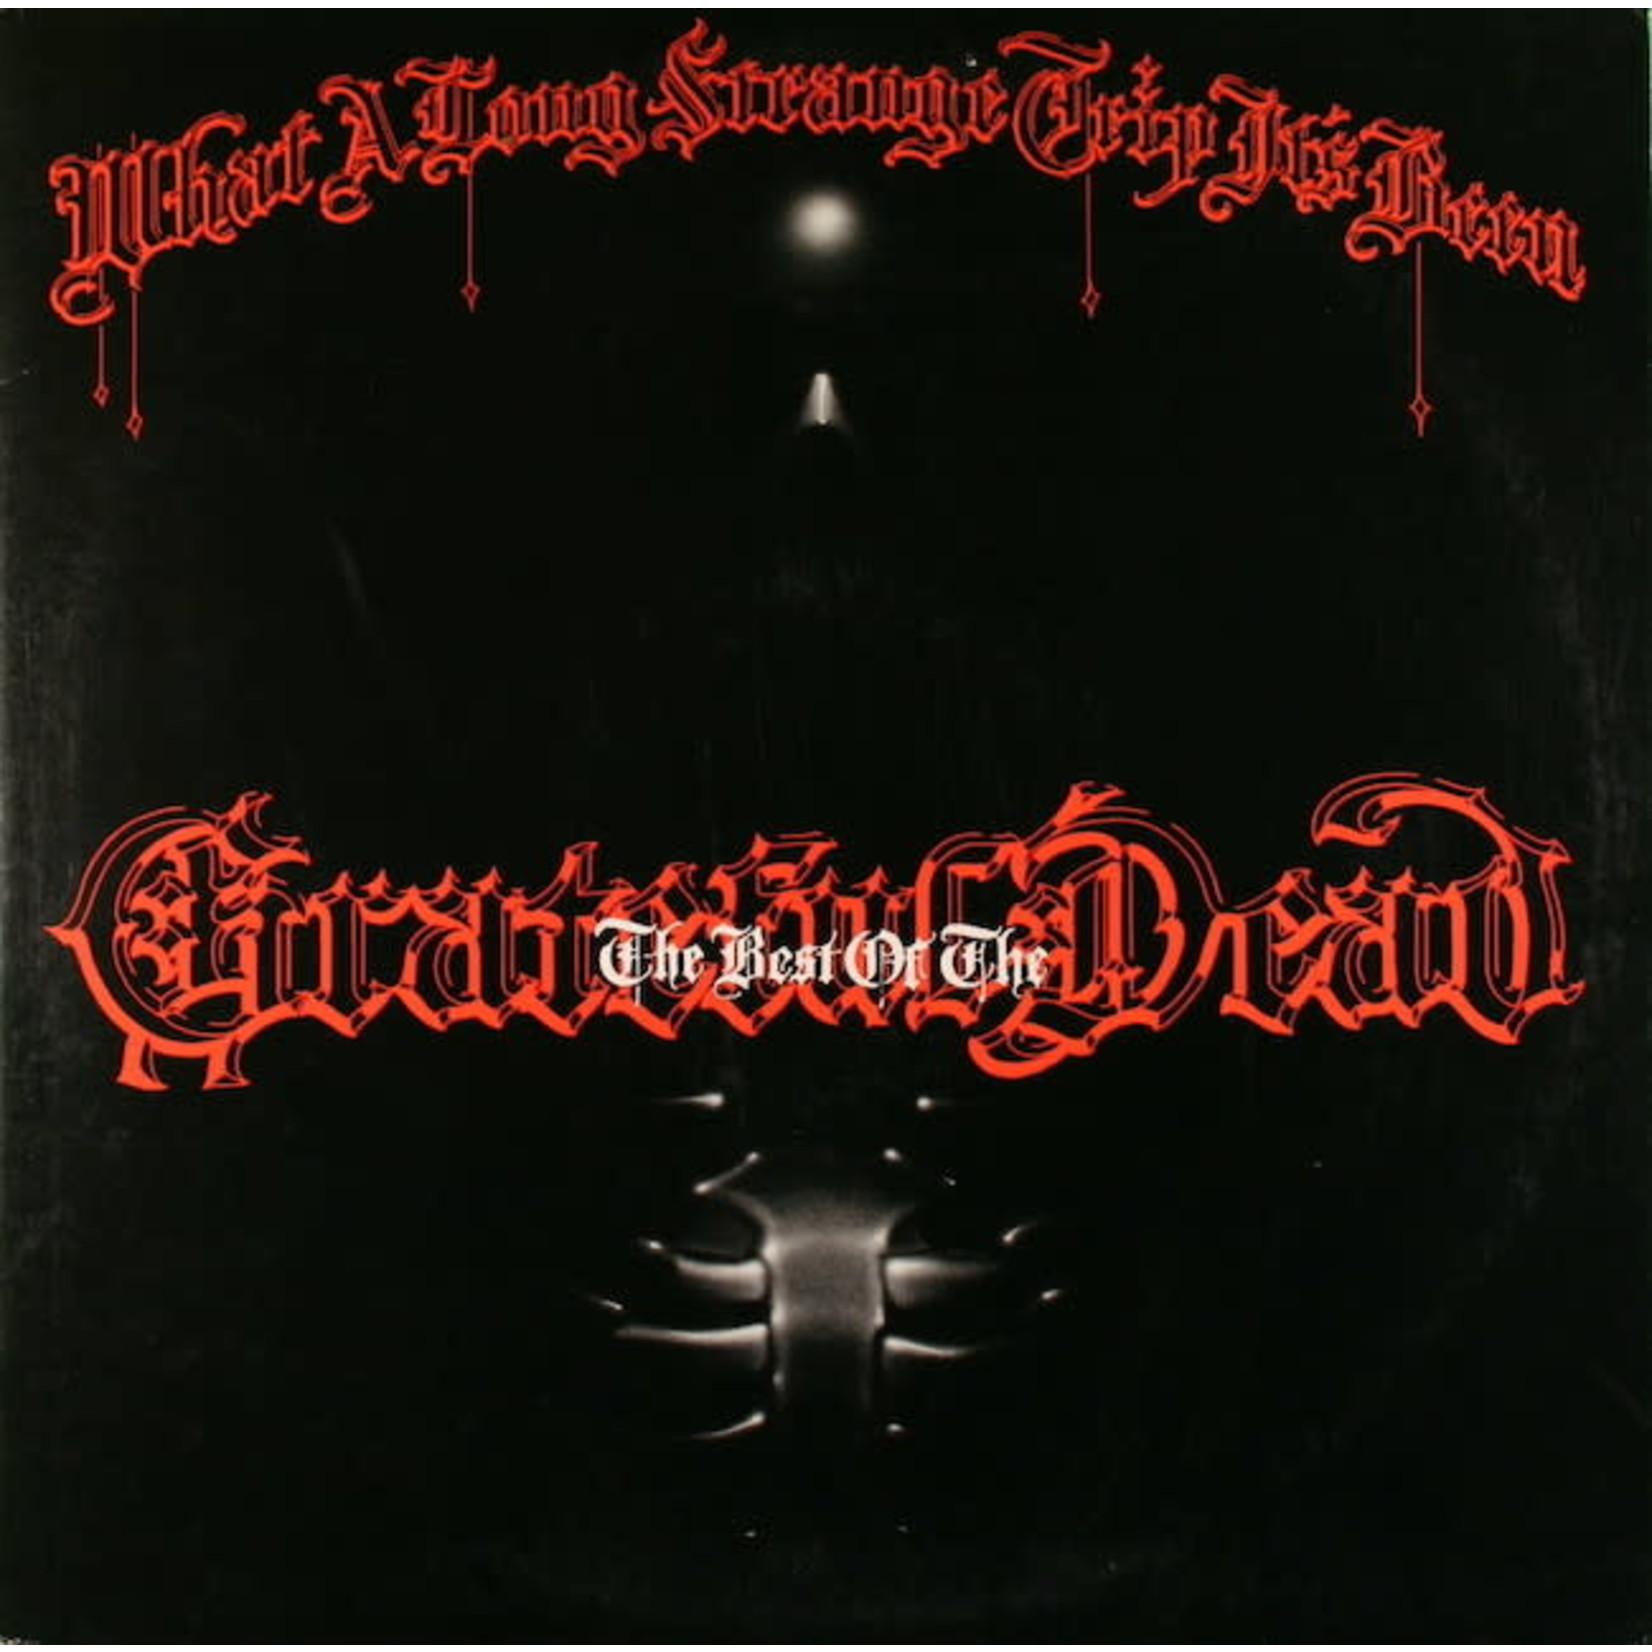 [Vintage] Grateful Dead: What a Long Strange Trip It's Been, The Best of...